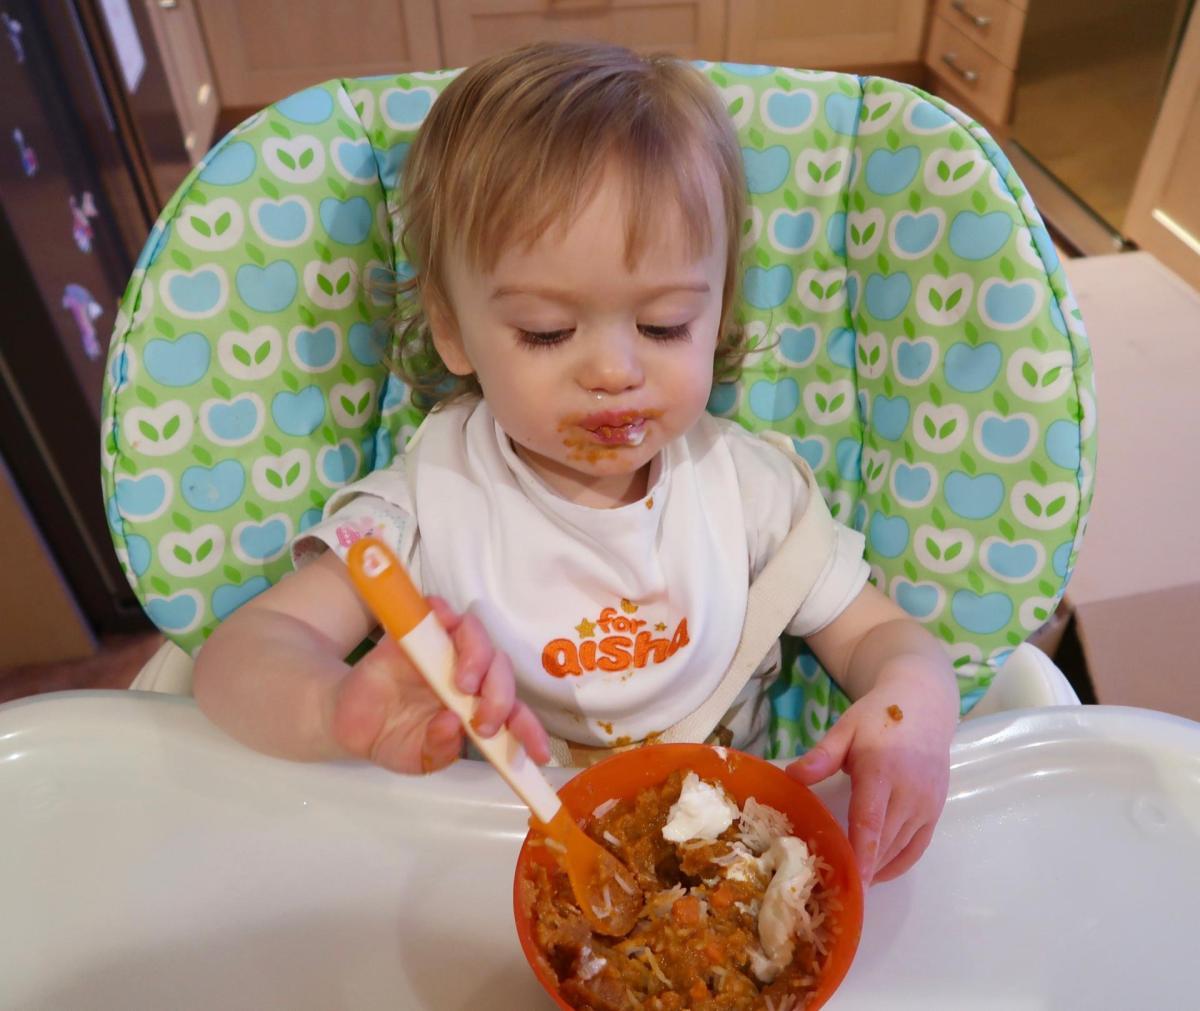 baby feeding themselves